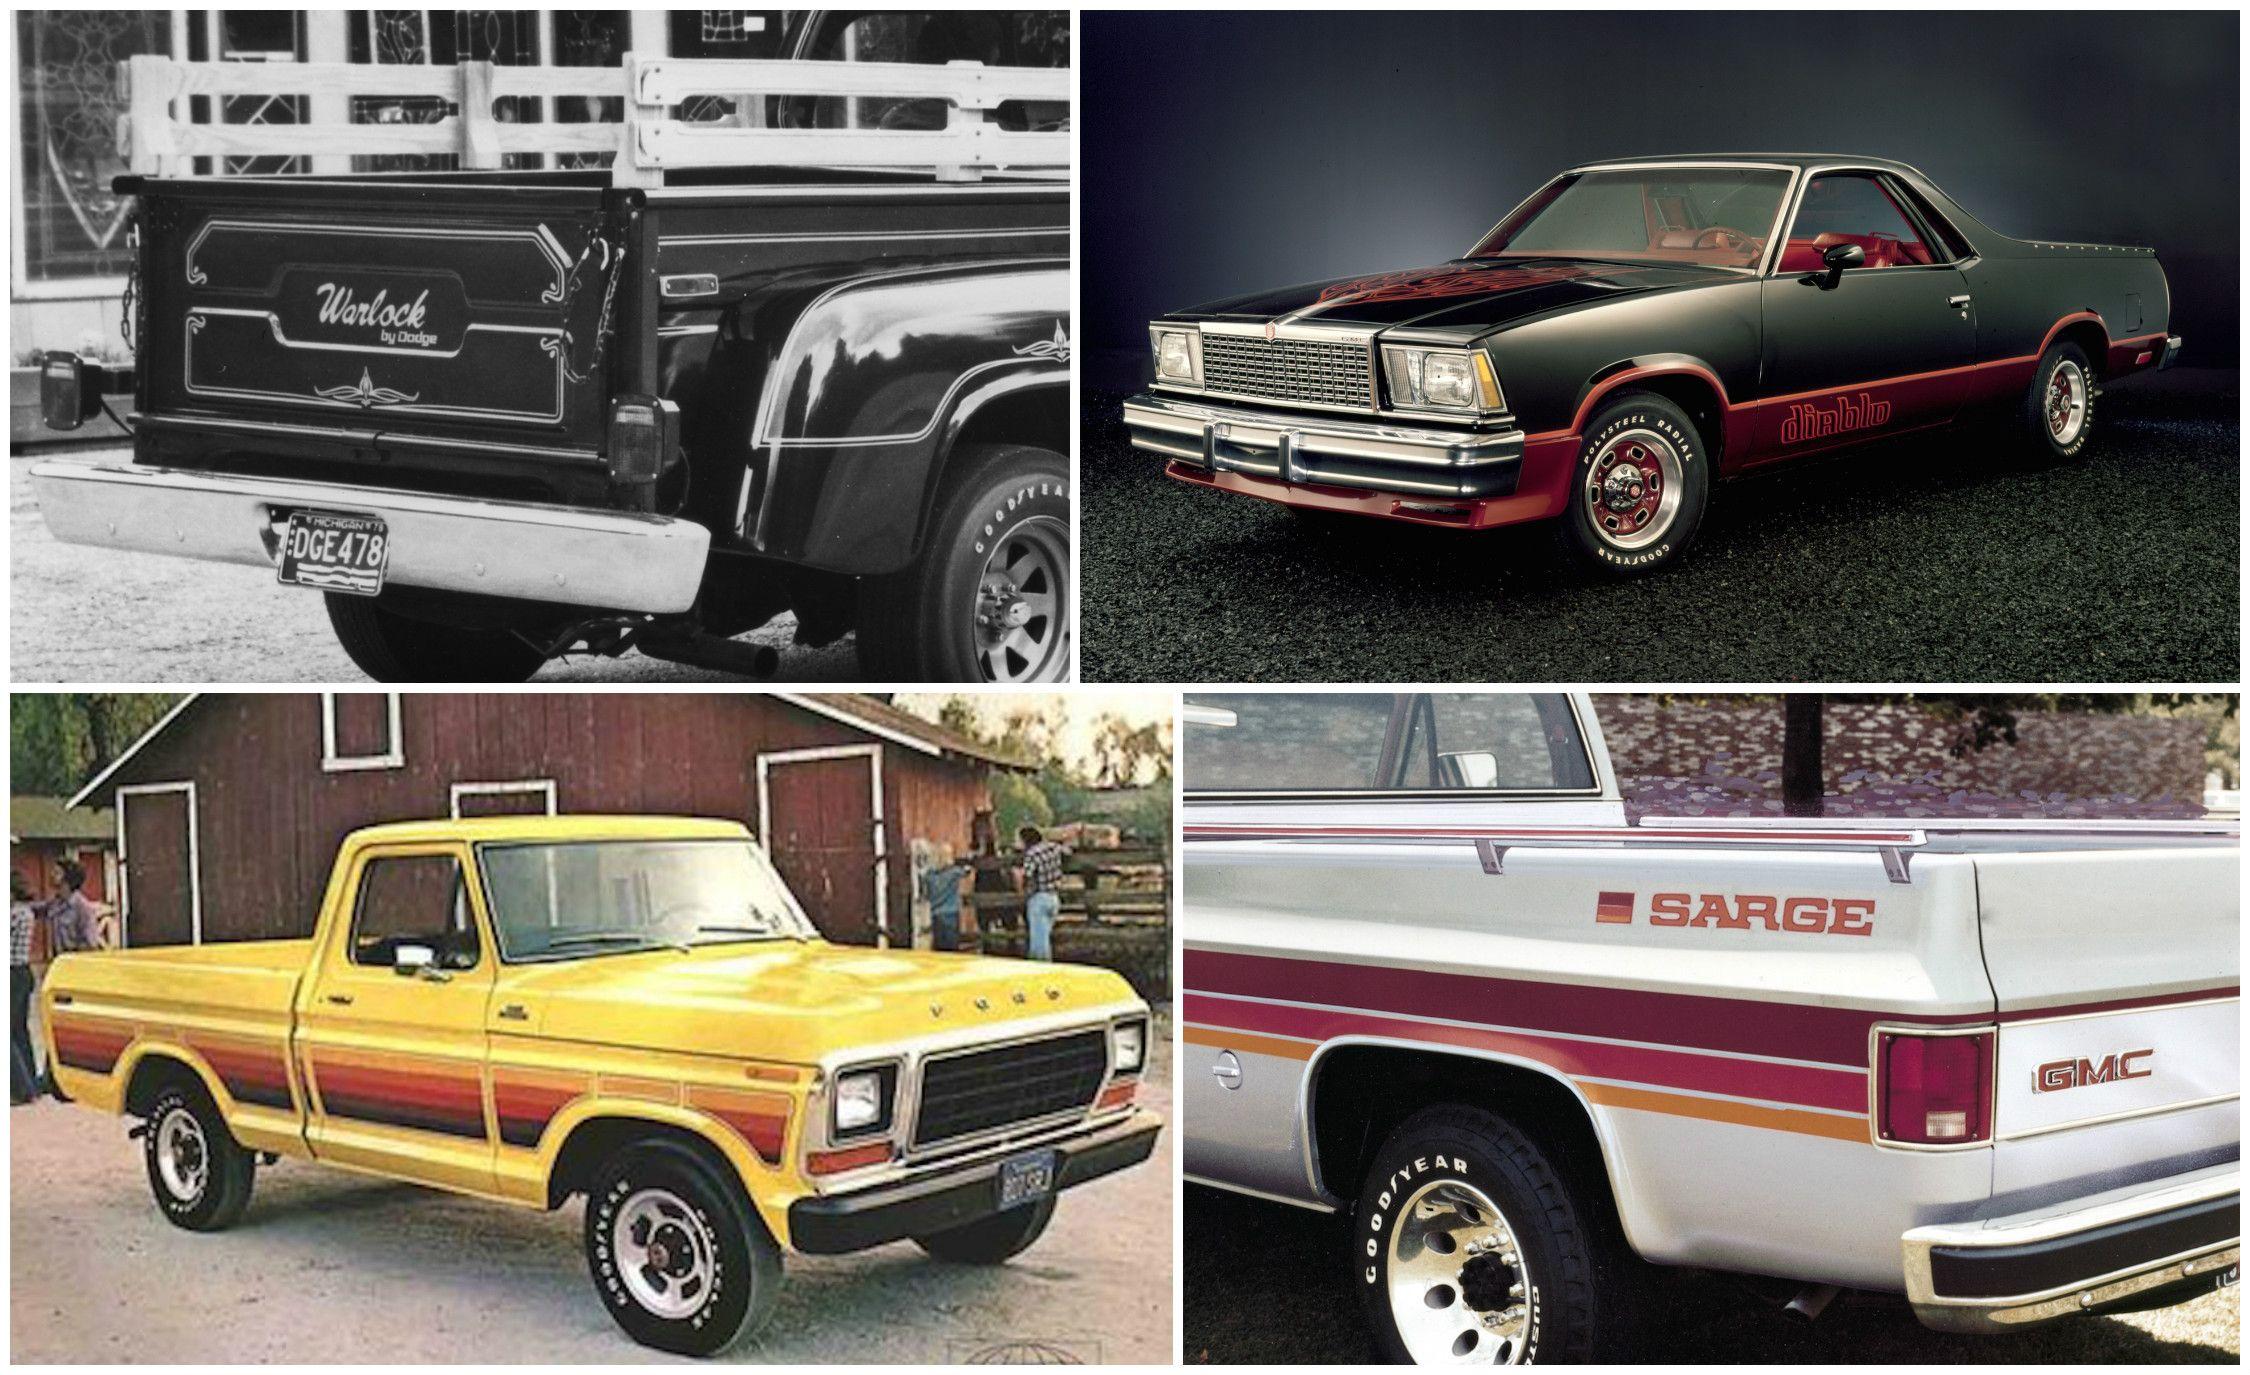 mondo macho special edition trucks of the \u002770s (k billy\u0027s supermondo macho special edition trucks of the \u002770s (k billy\u0027s super badge and stripe jobs)